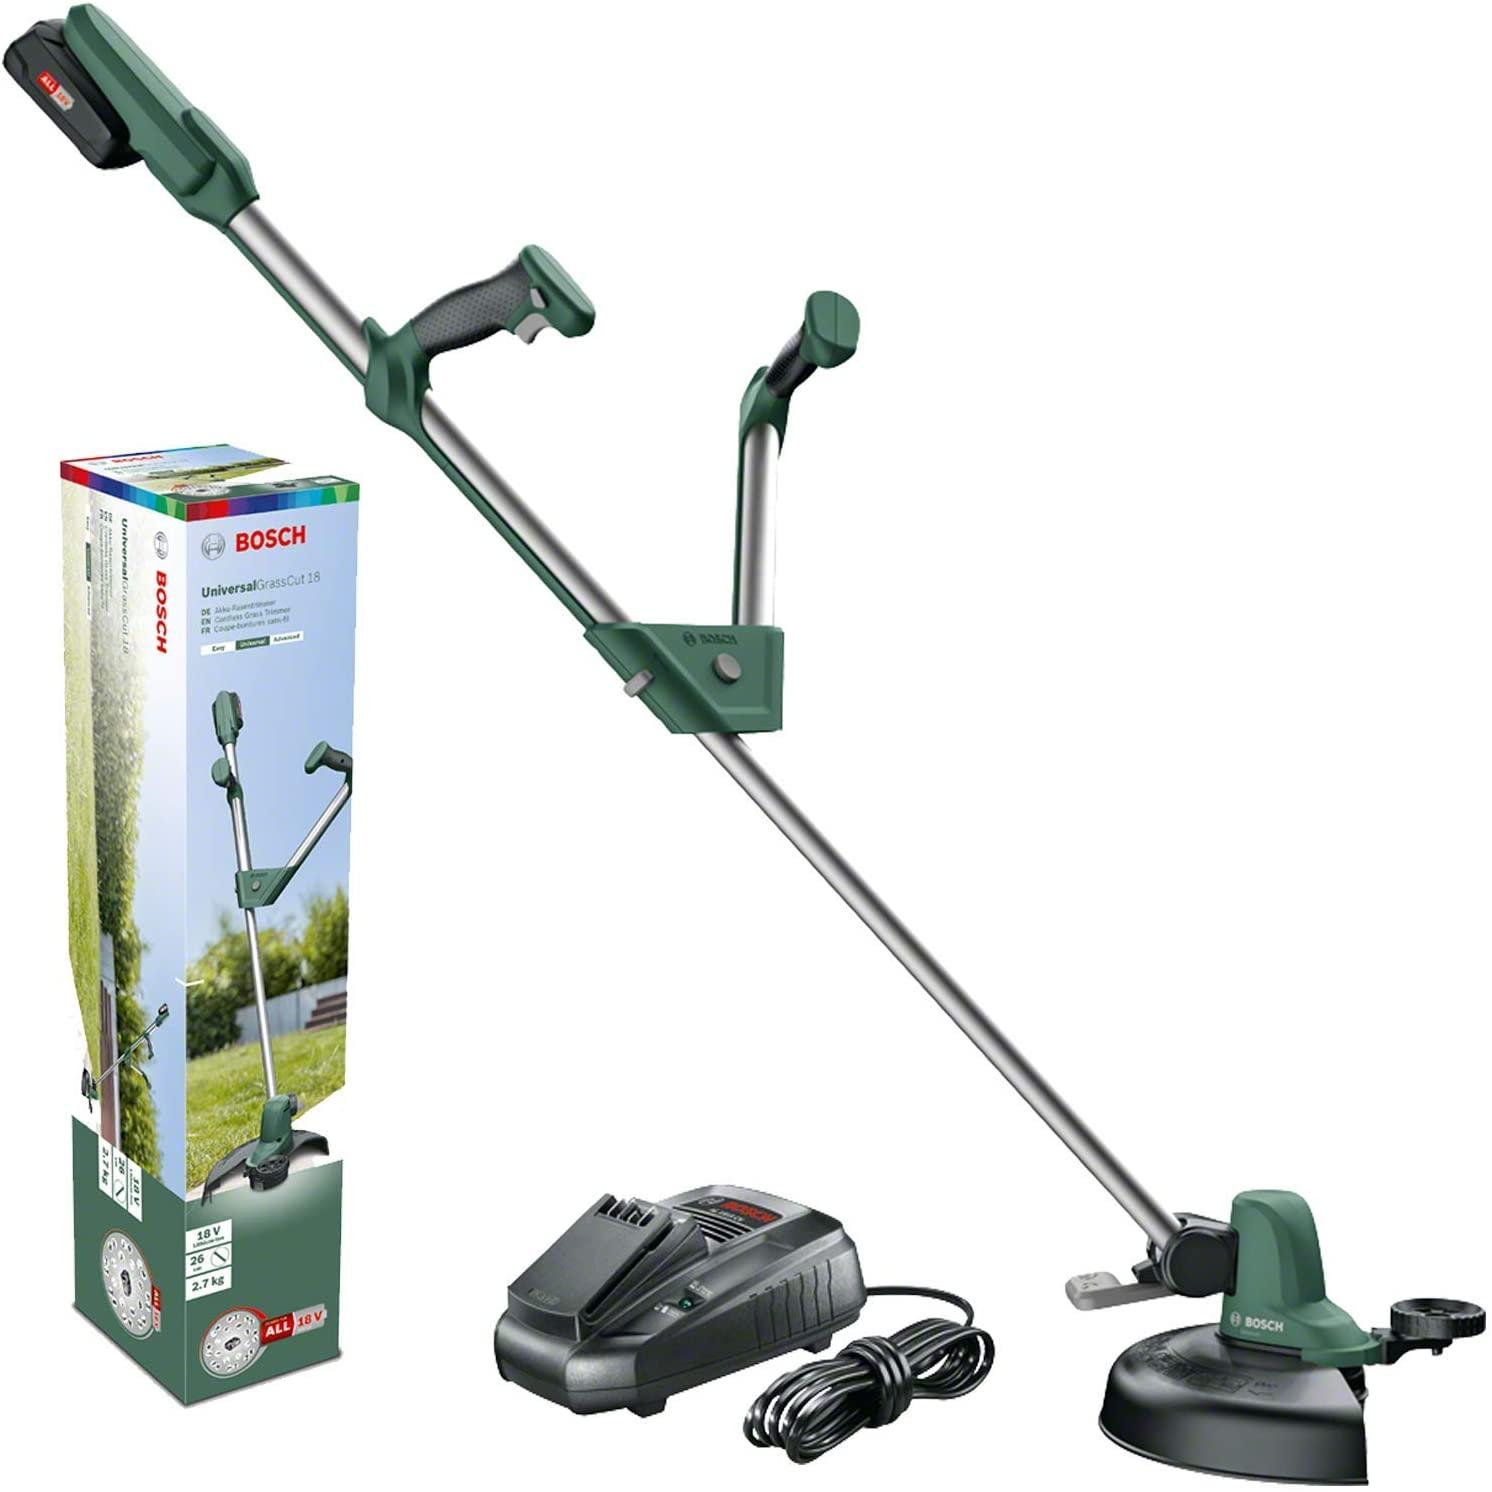 Taille-herbes sans fil Bosch UniversalGrassCut 18